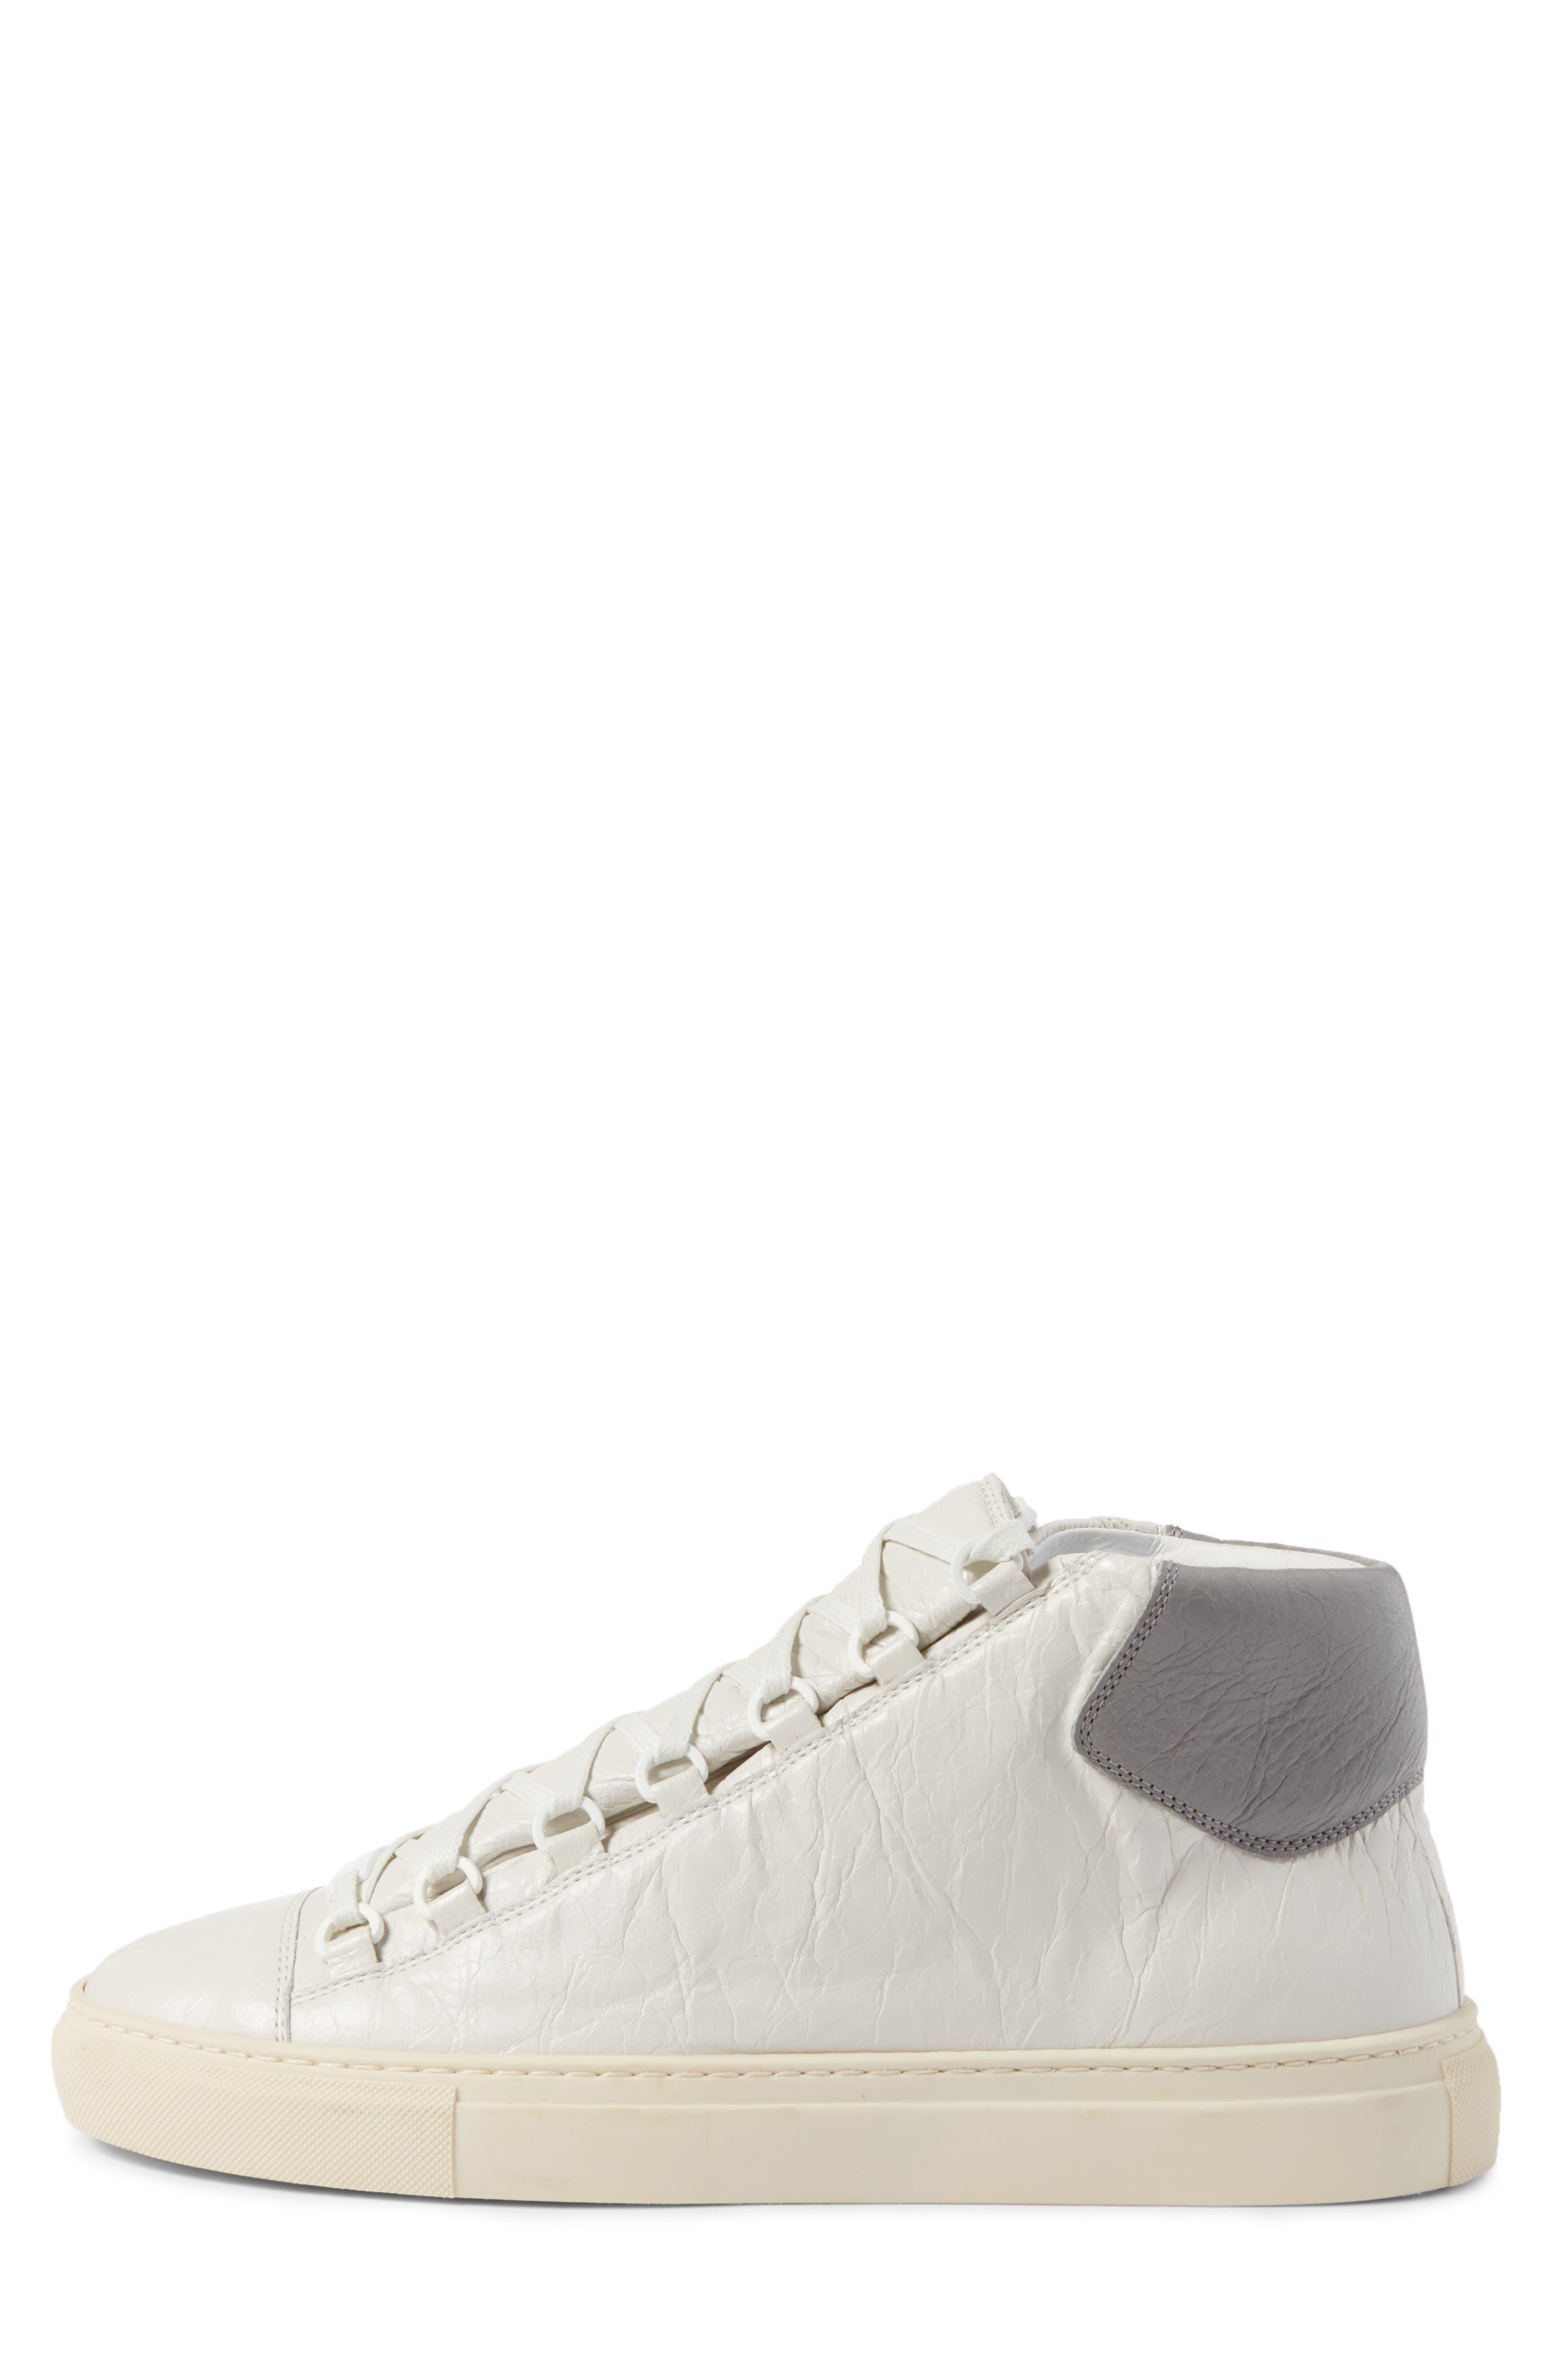 Arena High Sneaker,                             Alternate thumbnail 3, color,                             167